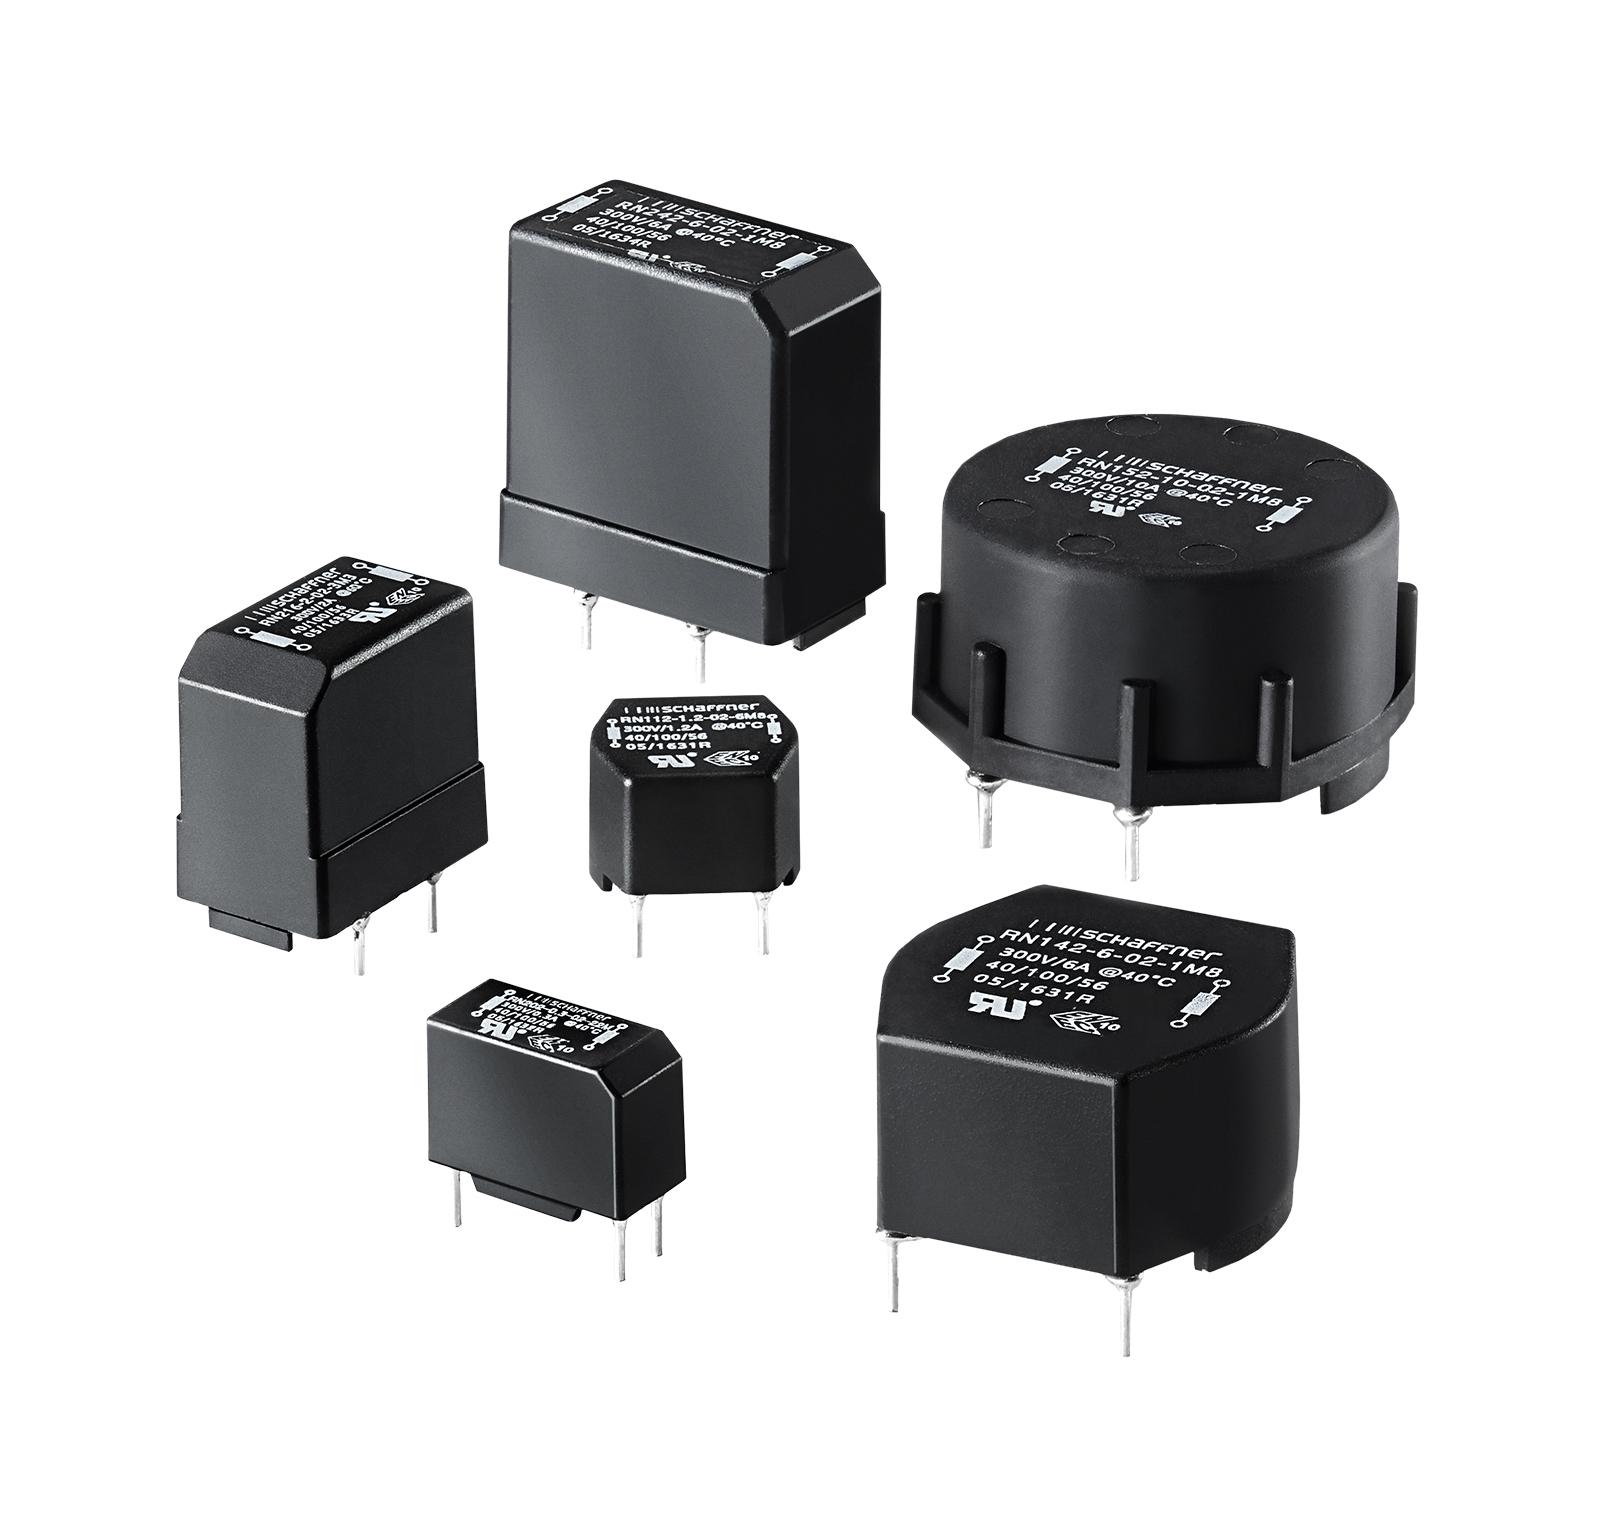 Image Description for https://tedi.itc-electronics.com/itcmedia/images/20200427/RN1121202_SCHAFFNERELEKTRONIKA_1.jpg